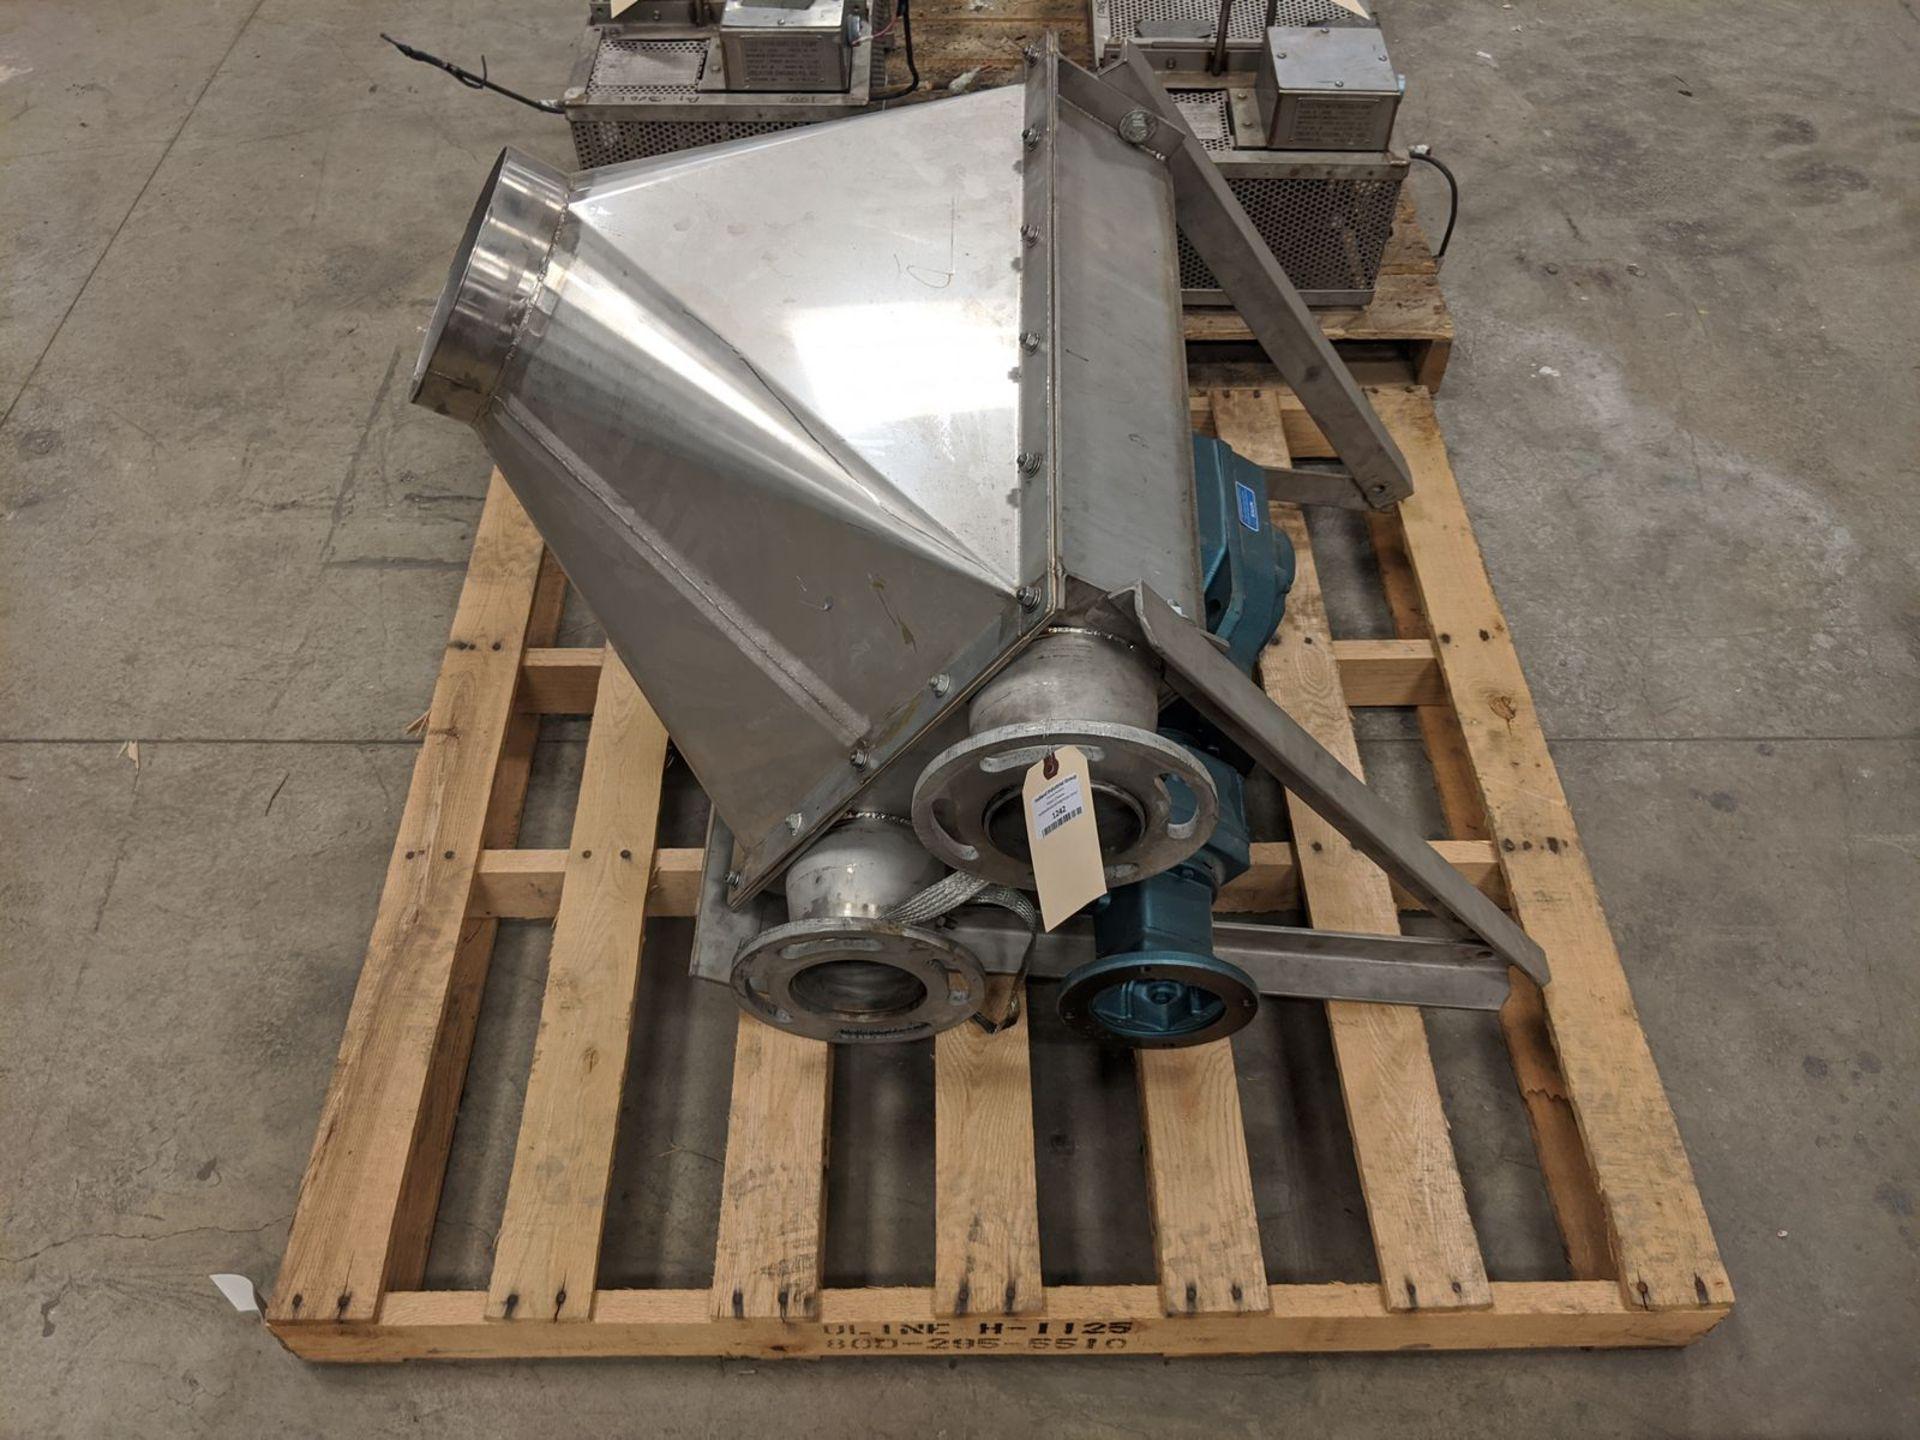 "Hapman Model H12230-C0 4"" Tube (Drag) Conveyor Hopper Gear Section"